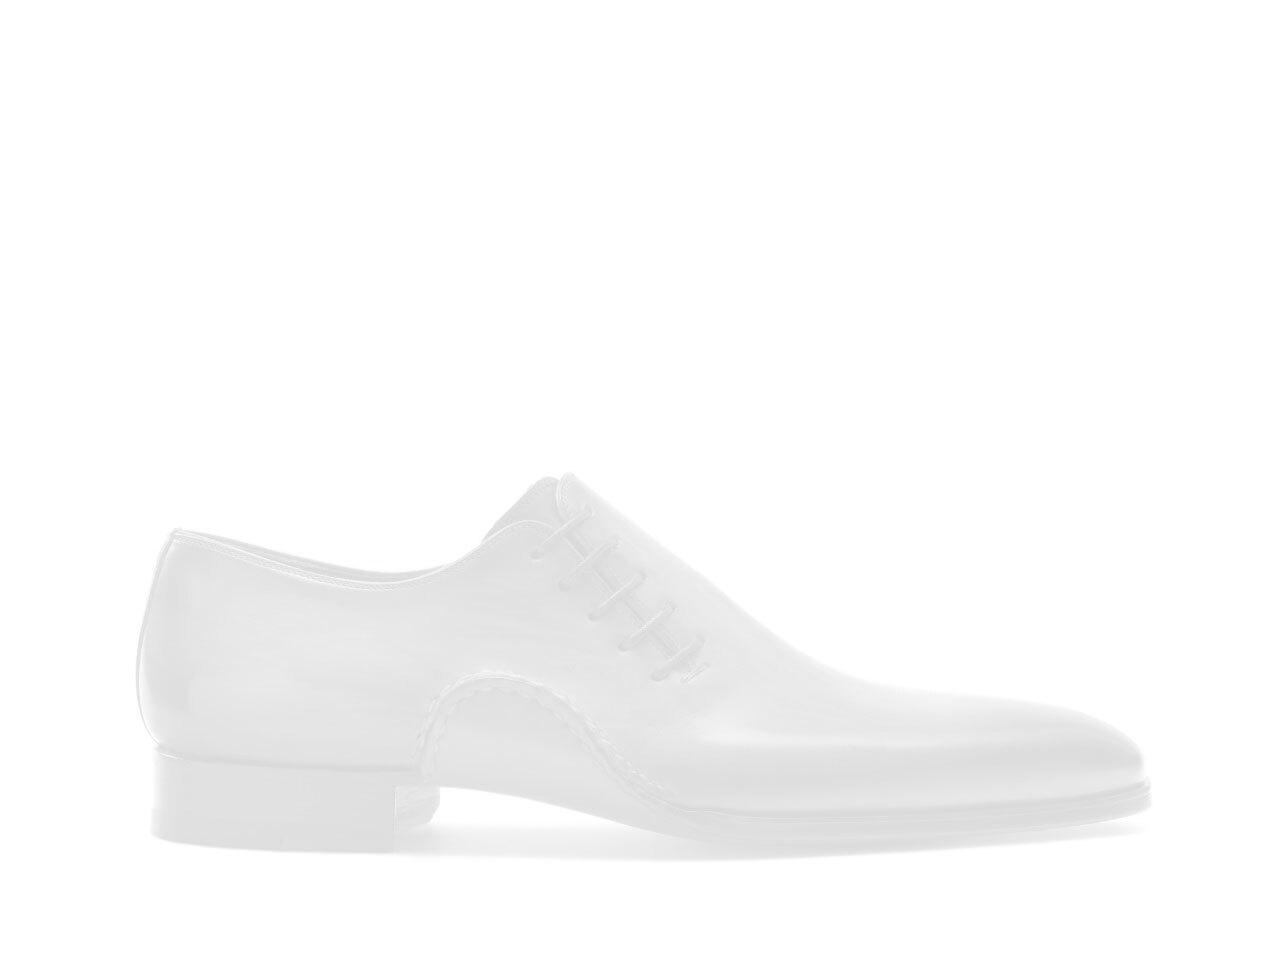 Cognac brown lizard penny loafer shoes for men - Magnanni